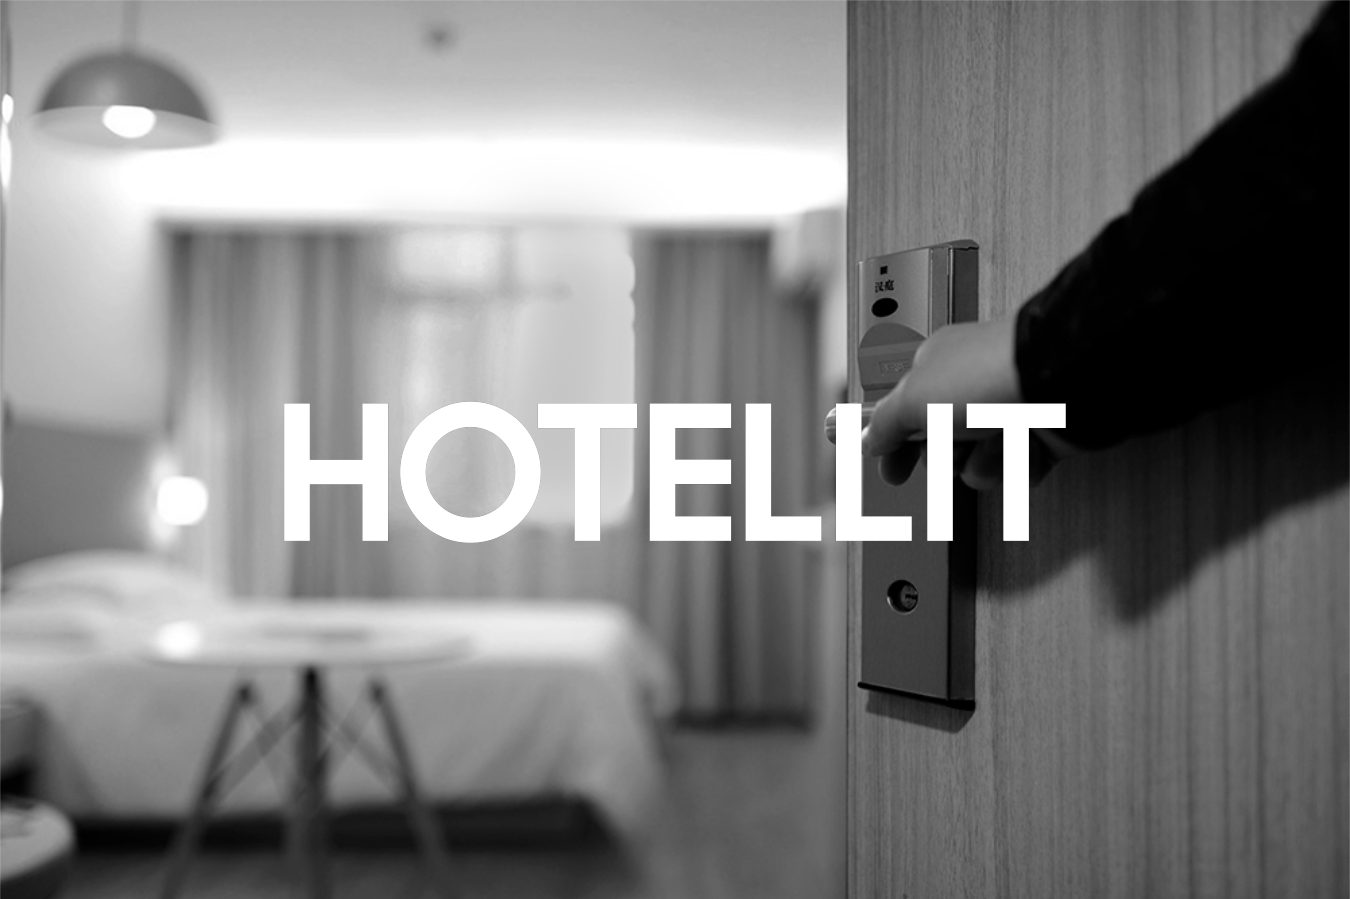 hotellit_1350x899